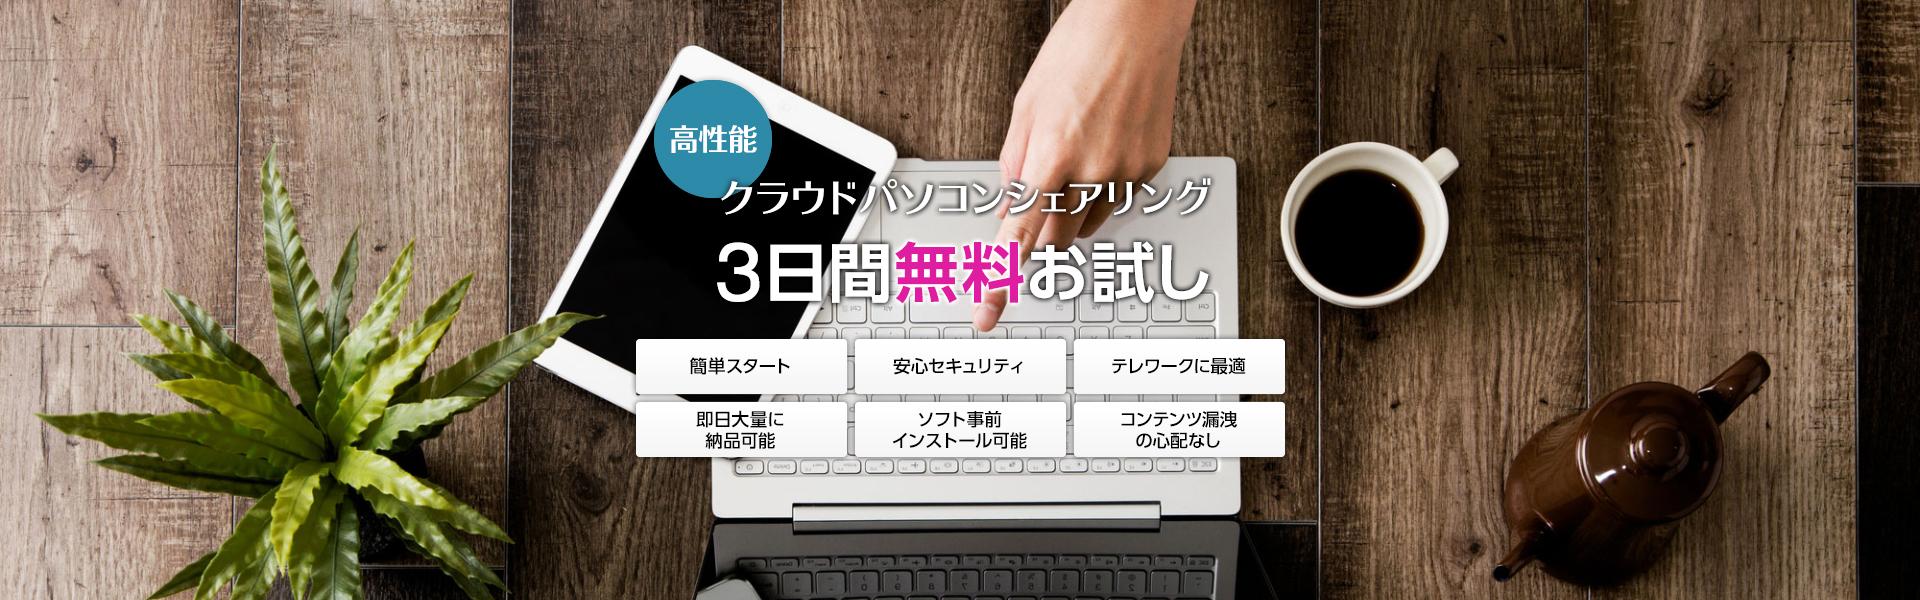 sharako クラウドパソコンシェアリング